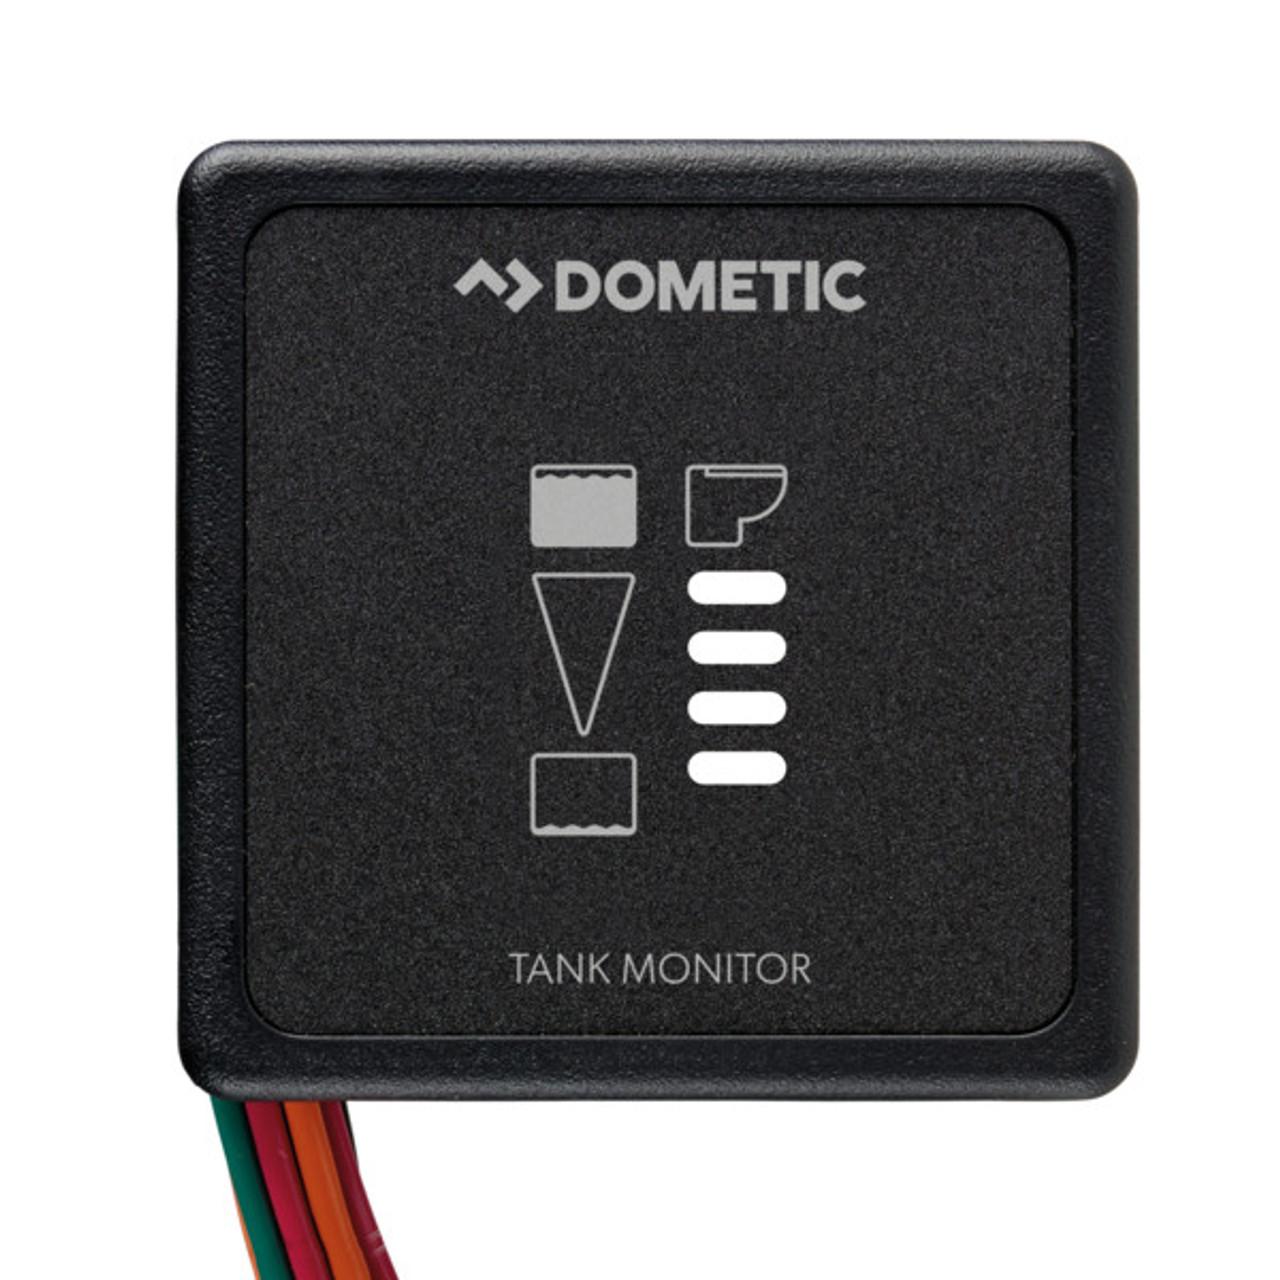 DTM04 PNL ONLY - BLACK 604401